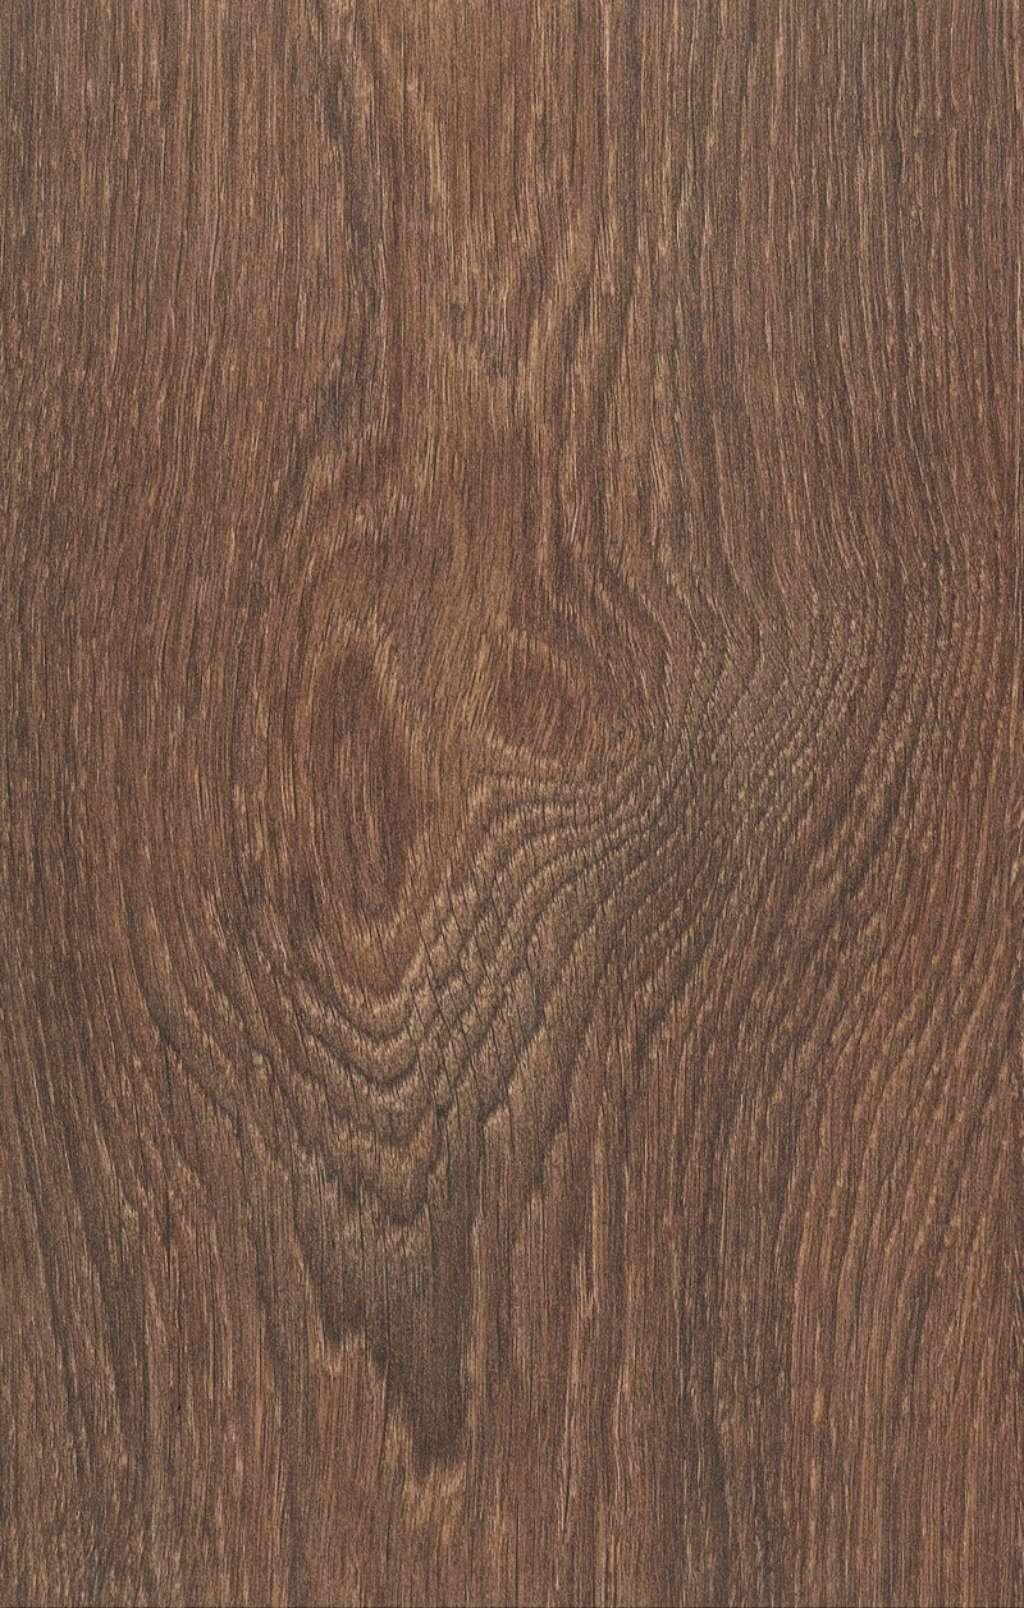 Ламинат Kronospan «8262 Дуб Барди» из коллекции Forte